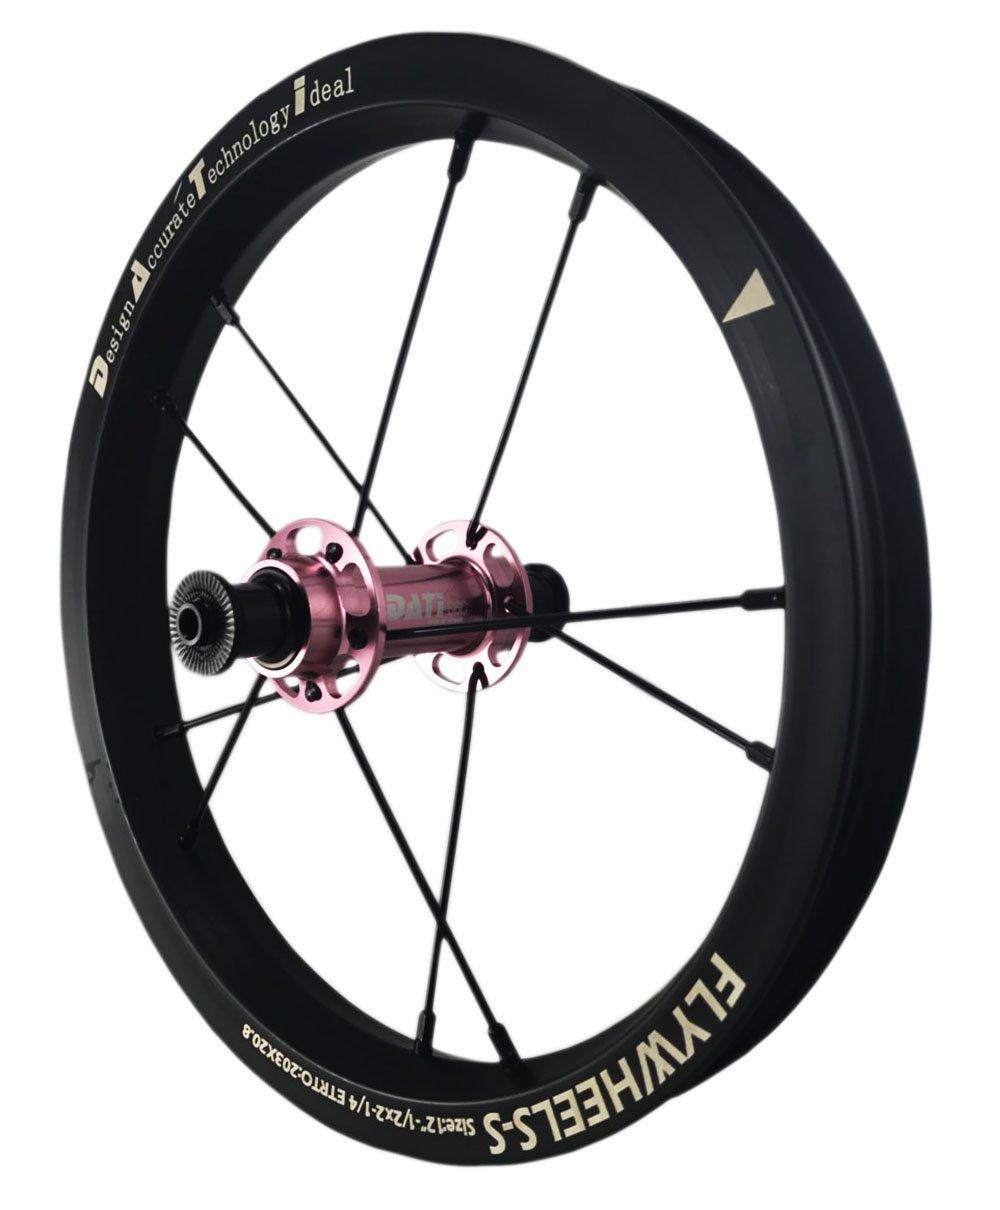 DATI 12インチ S6C-W Alloy バランスバイク Kids Balance Bike Bicycle Super light 子供自転車ホイール B07BLTQNDX 90x10MM for Bixbi Puky|ピンク ピンク 90x10MM for Bixbi Puky